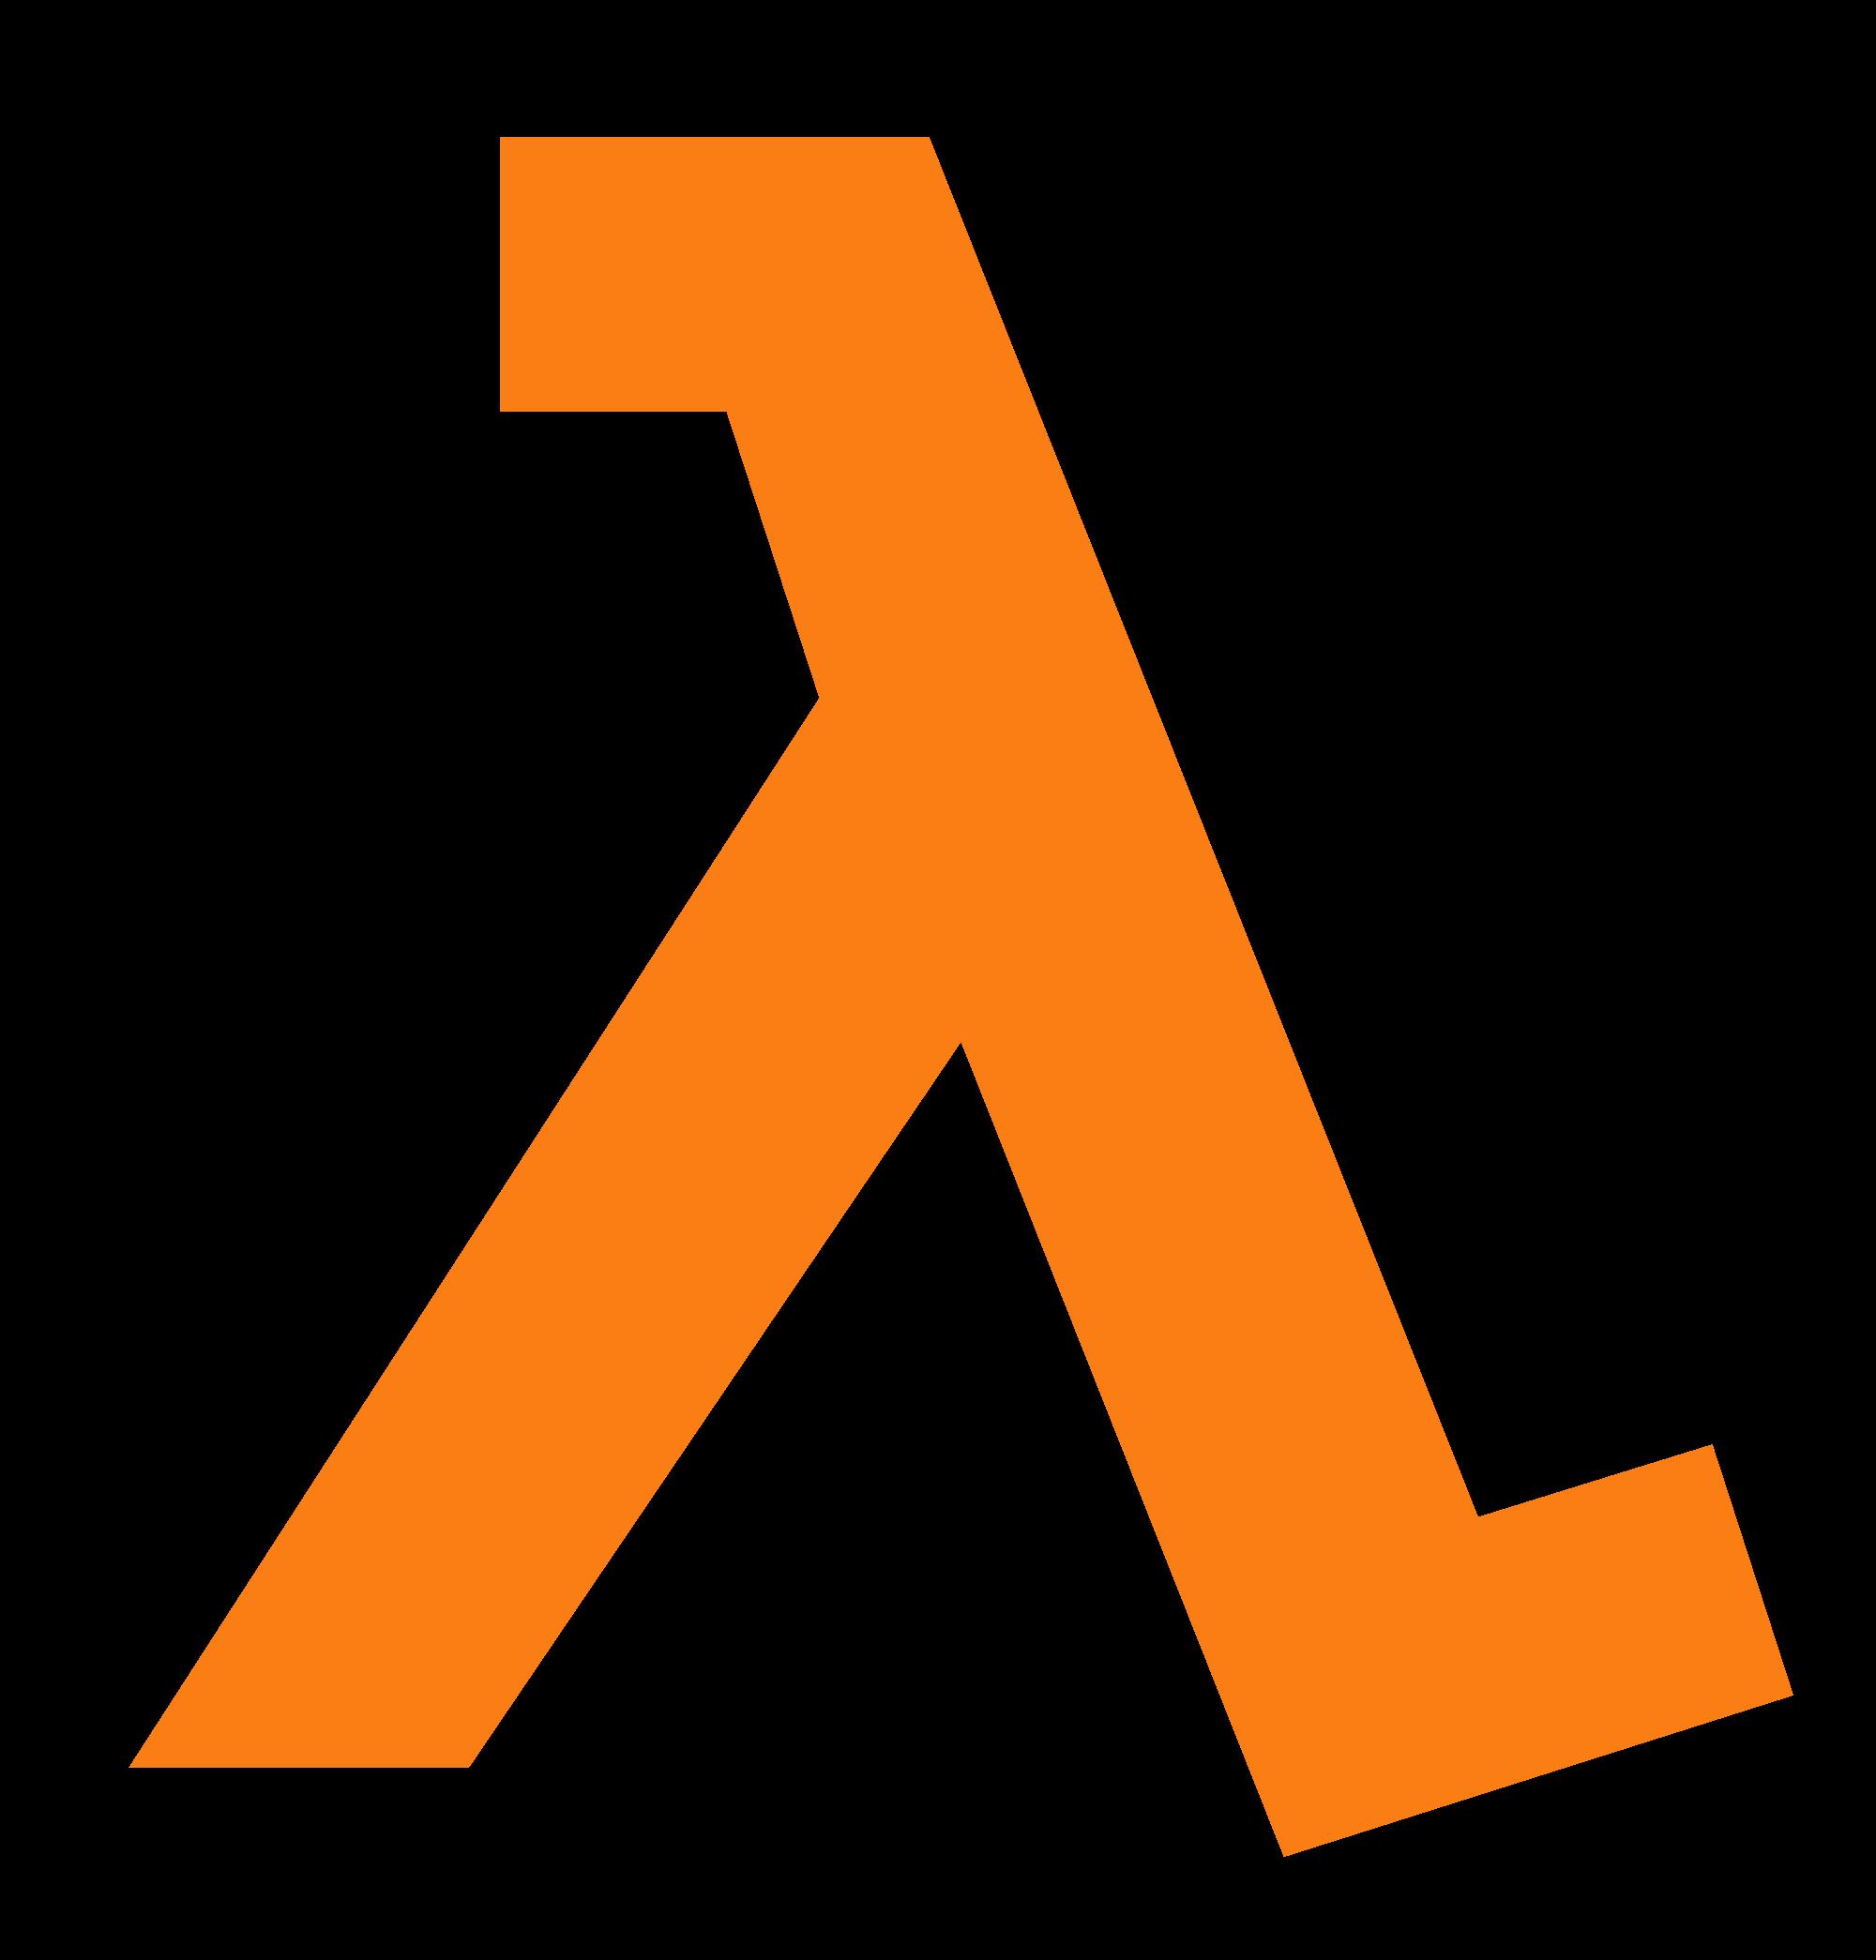 Lambda Logo from Wikimedia